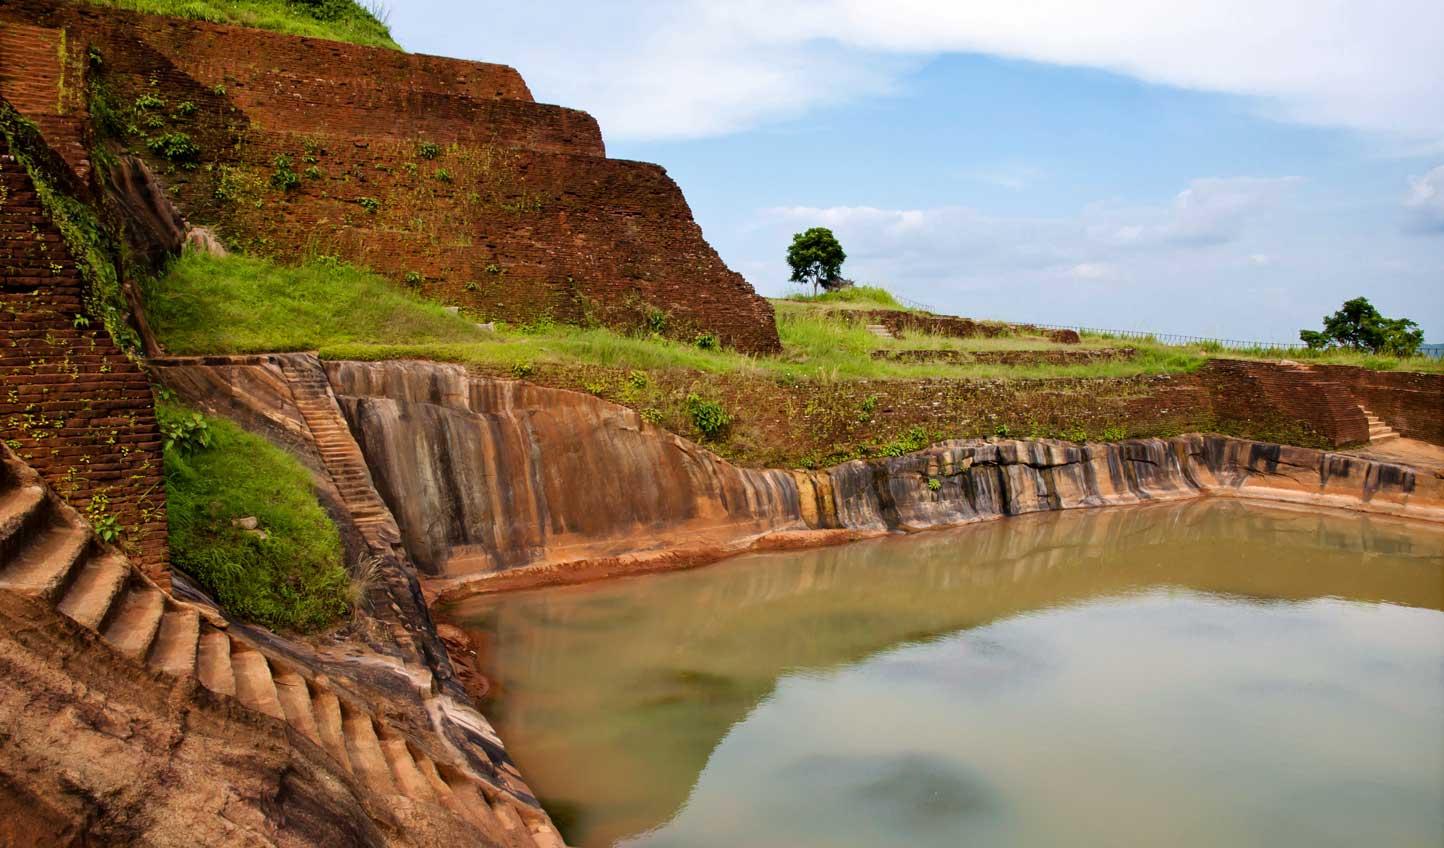 Climb atop Sigiriya Rock and enjoy the view